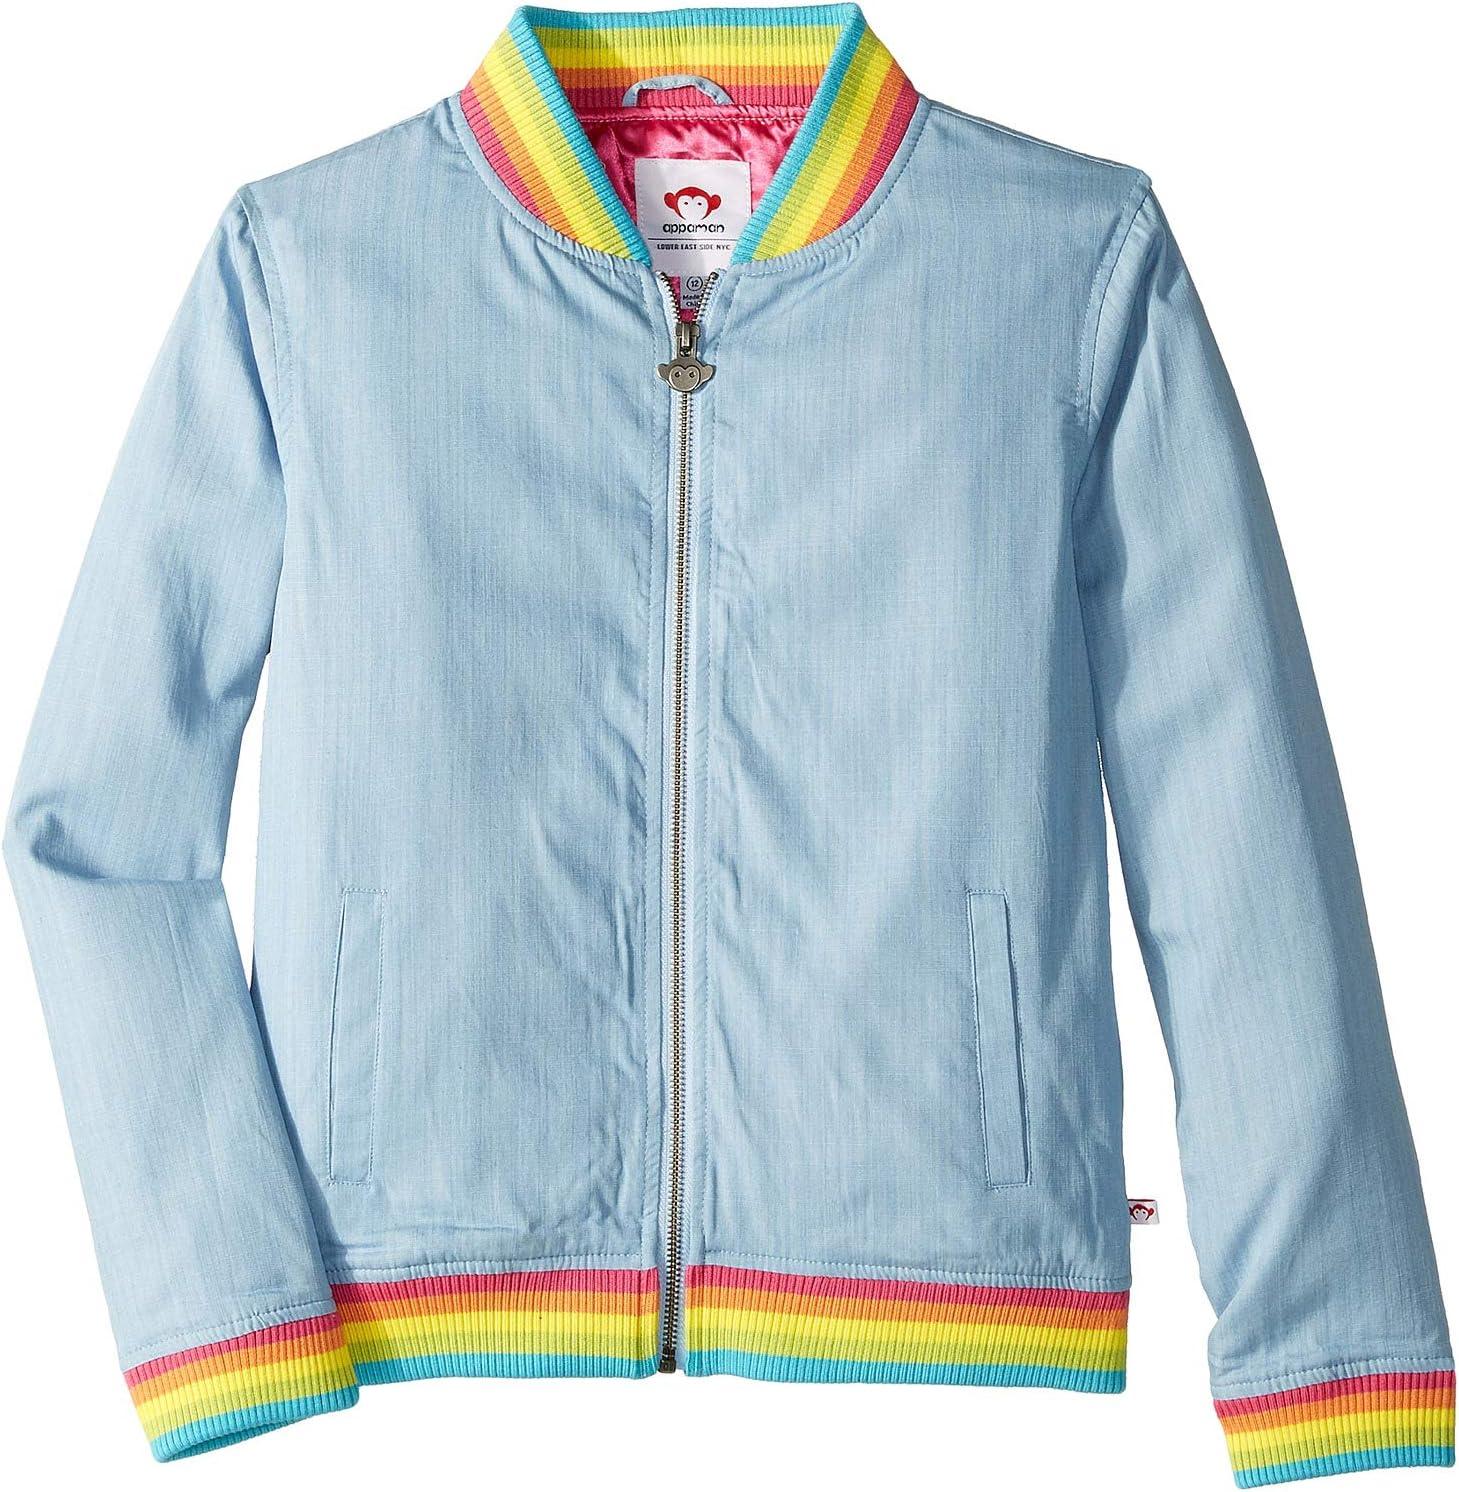 TC-5-Outerwear-2019-05-22